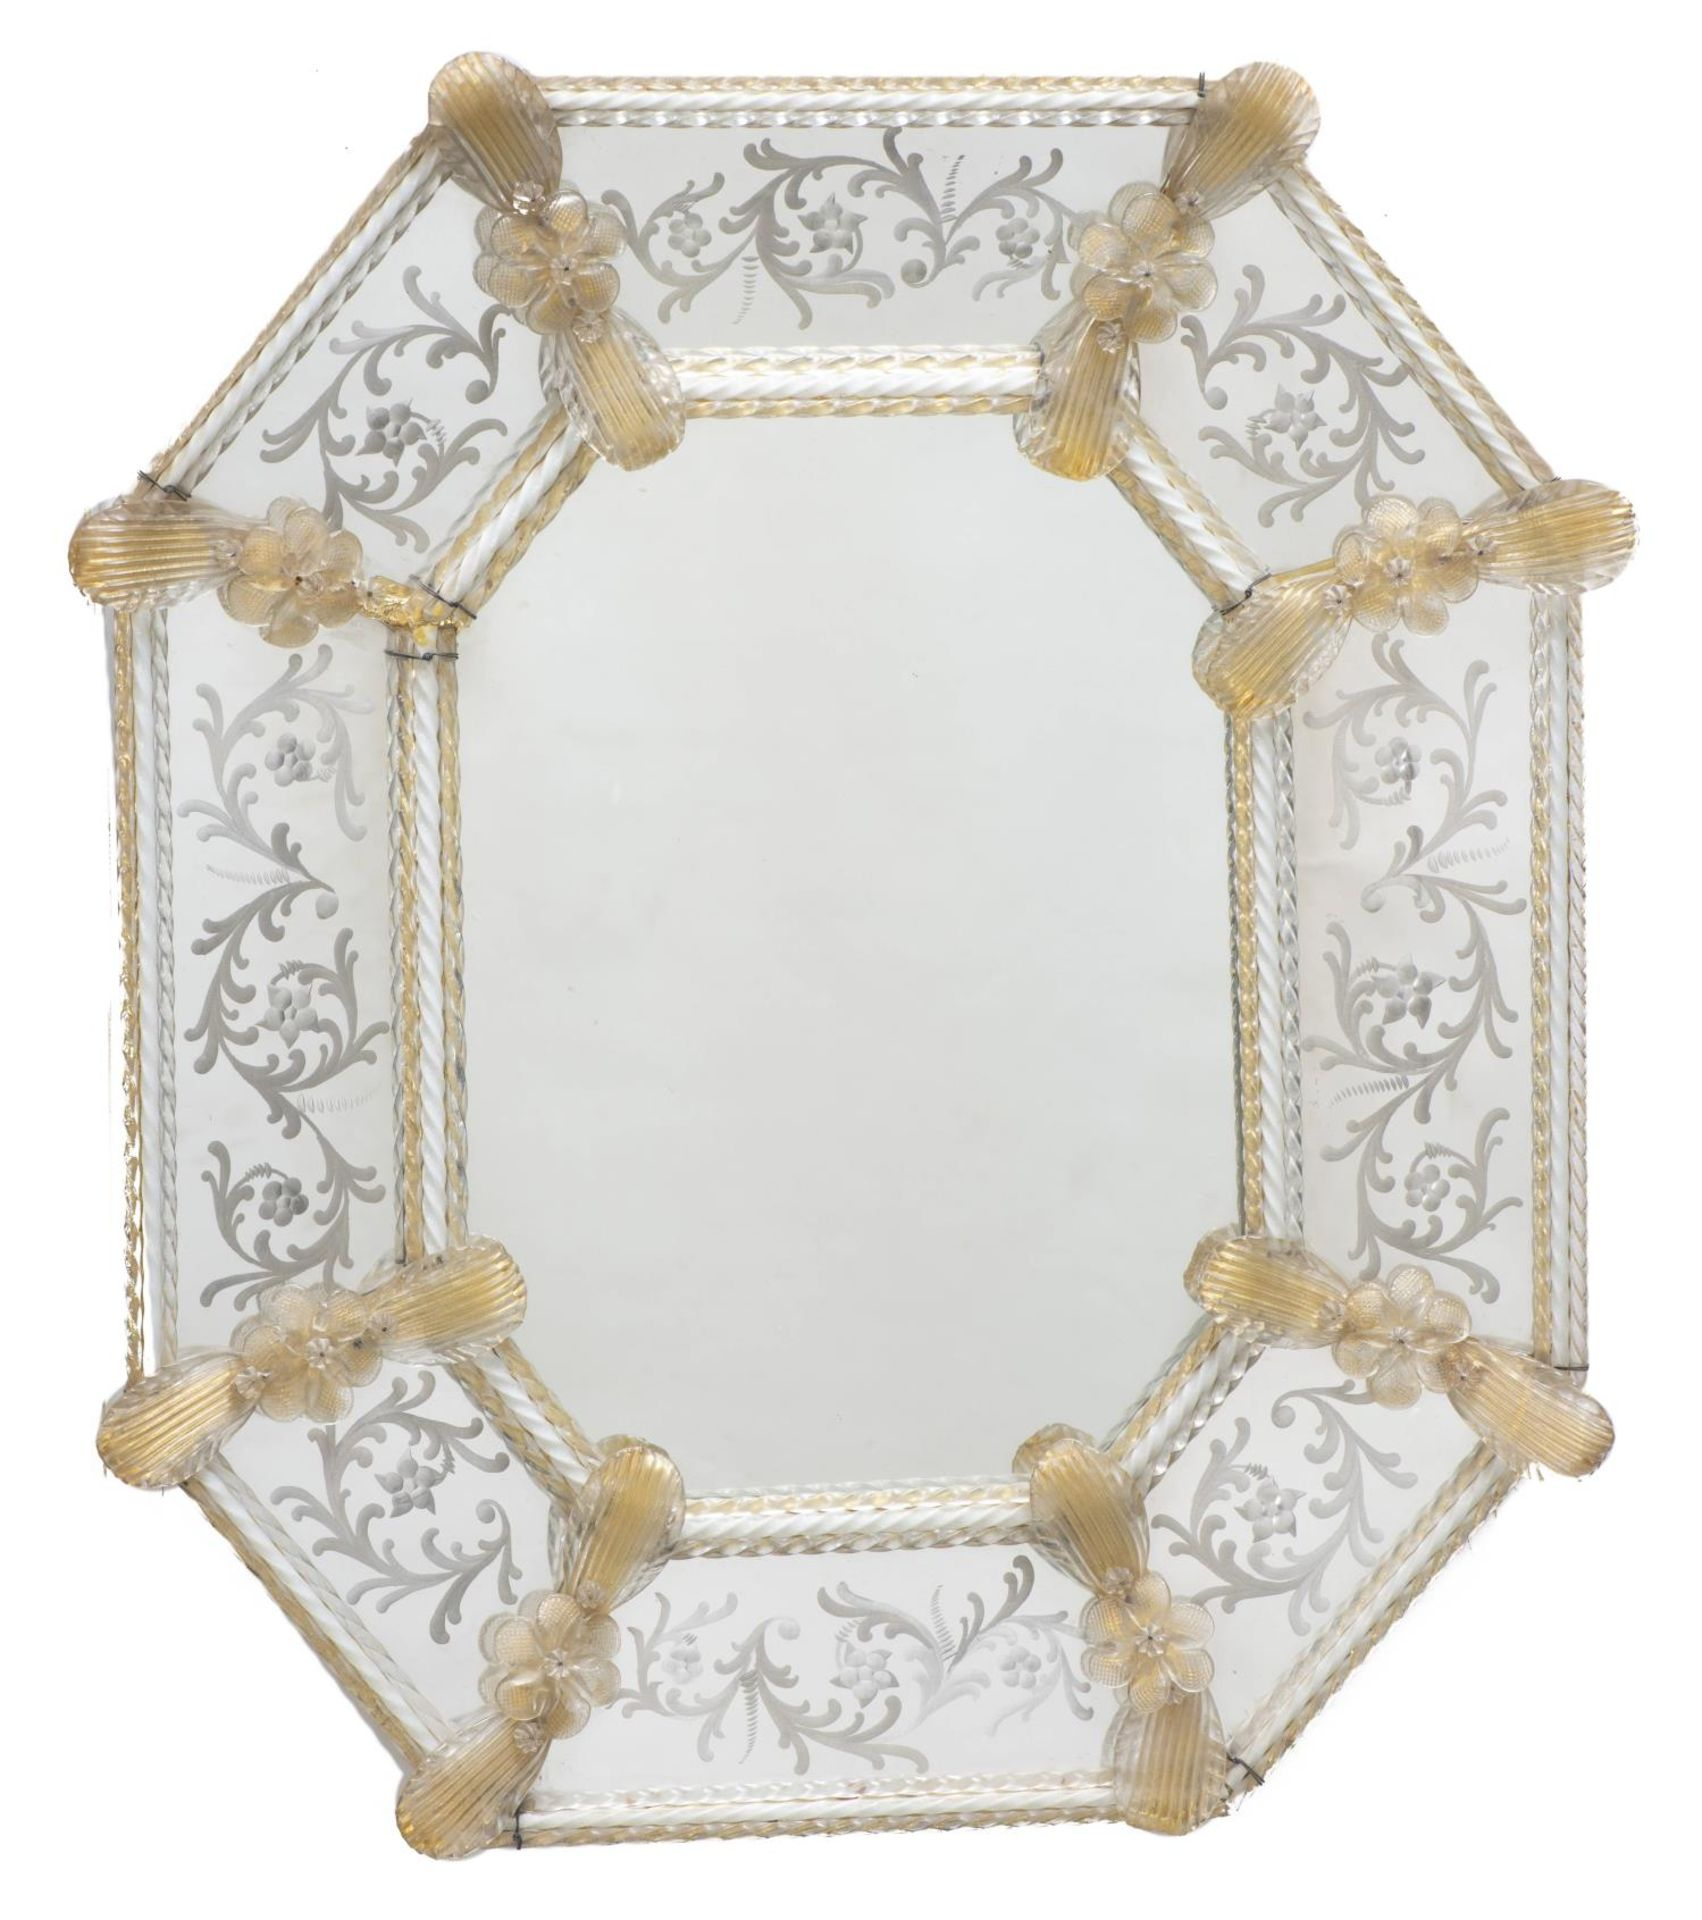 Miroir vénitien octogonal encadré de torsades et de fleurs en verre